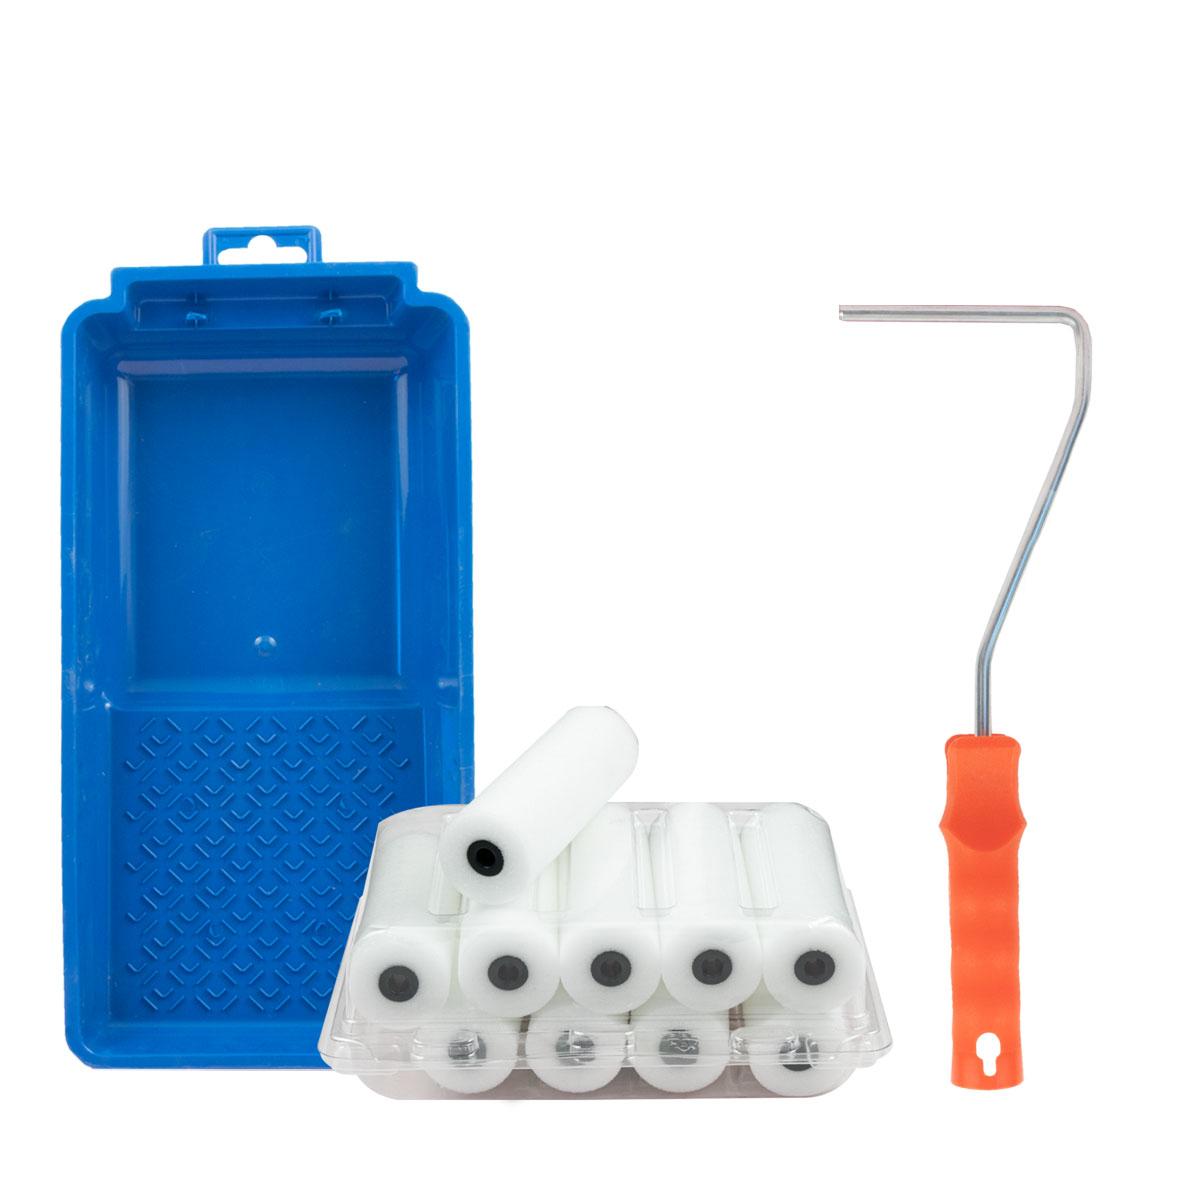 Lackierset- 10x Schaumstoffwalze gerade 11cm + HK-Bügel 28cm + Farbwanne 14x30cm